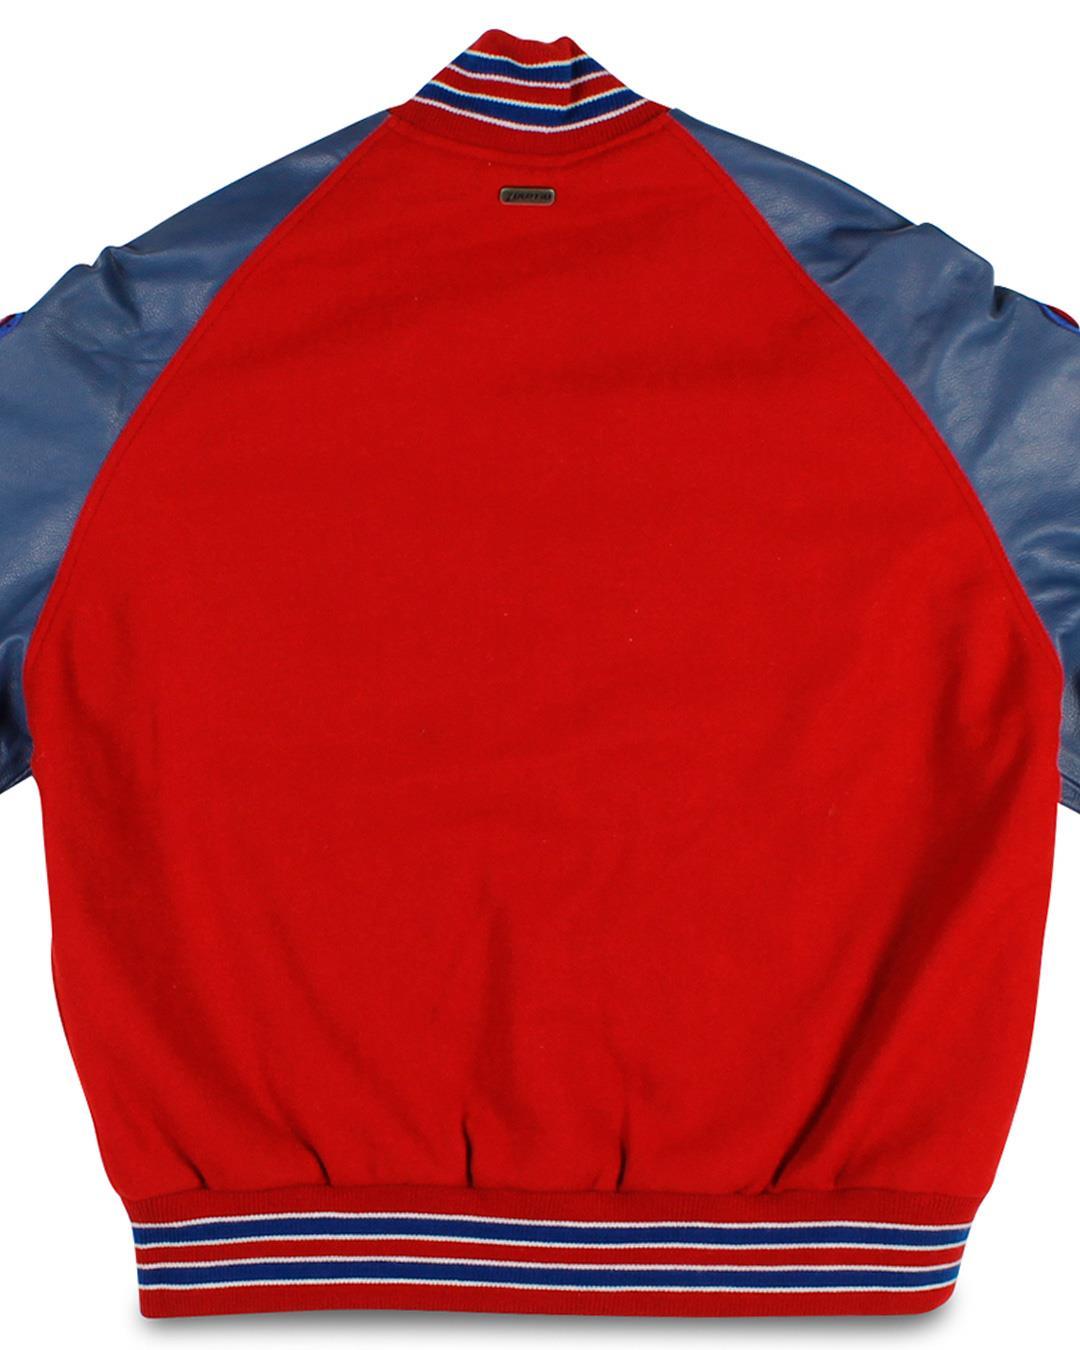 East Rankin Academy Varsity Jacket, Pelahatchie MS - Back